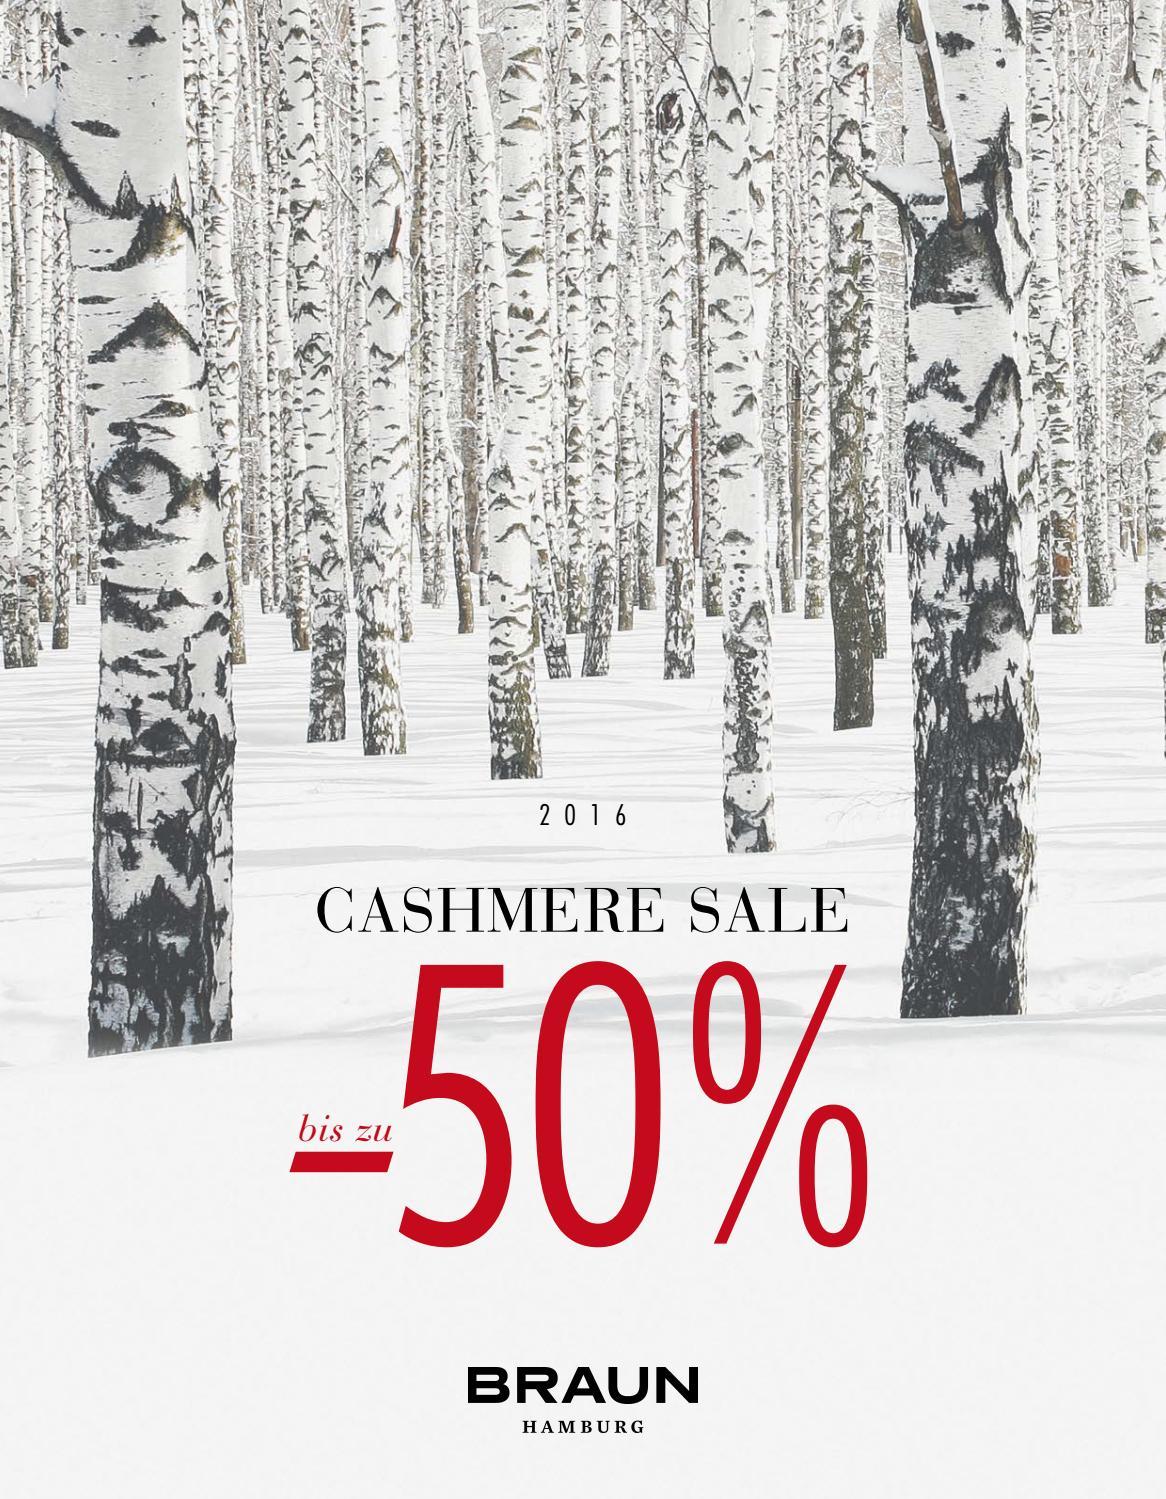 cashmere winter sale 2016 by braun hamburg gmbh co kg issuu. Black Bedroom Furniture Sets. Home Design Ideas